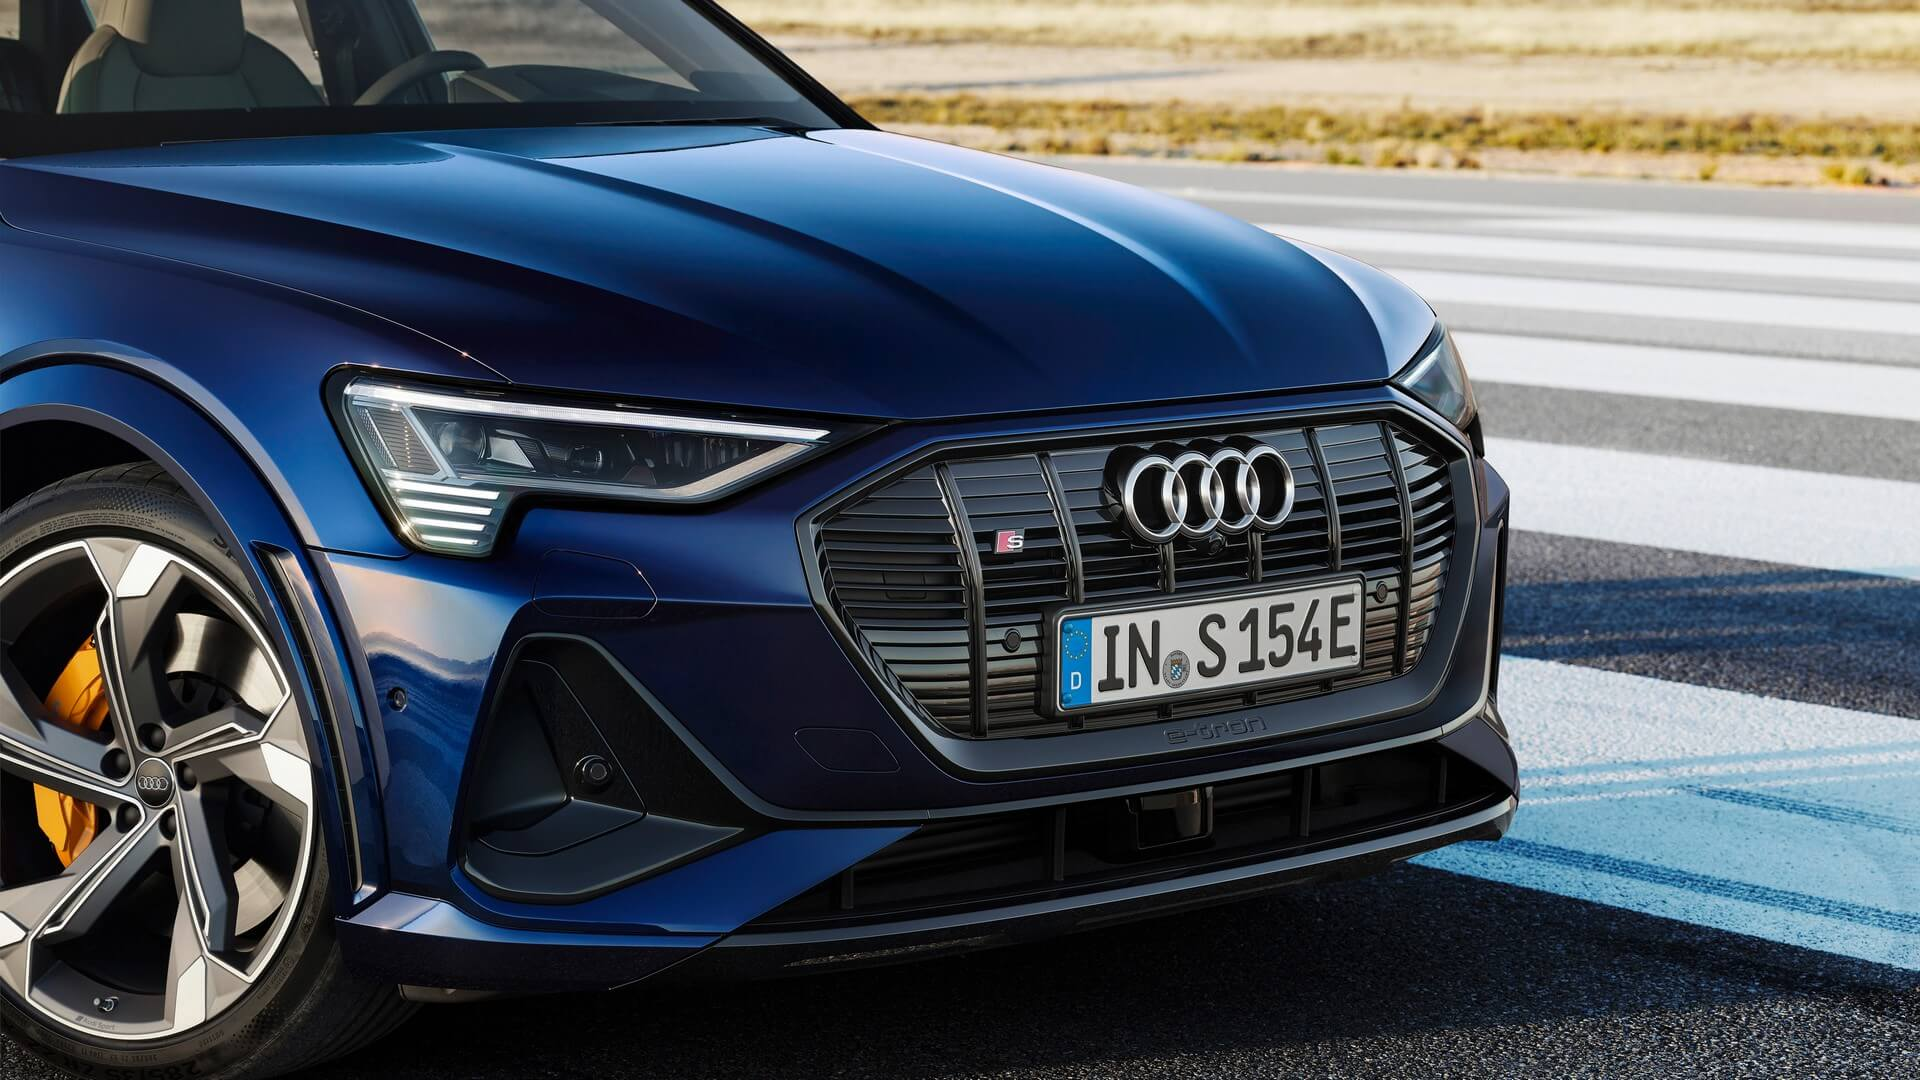 Audi-E-Tron-S-and-E-Tron-S-Sportback-2020-118